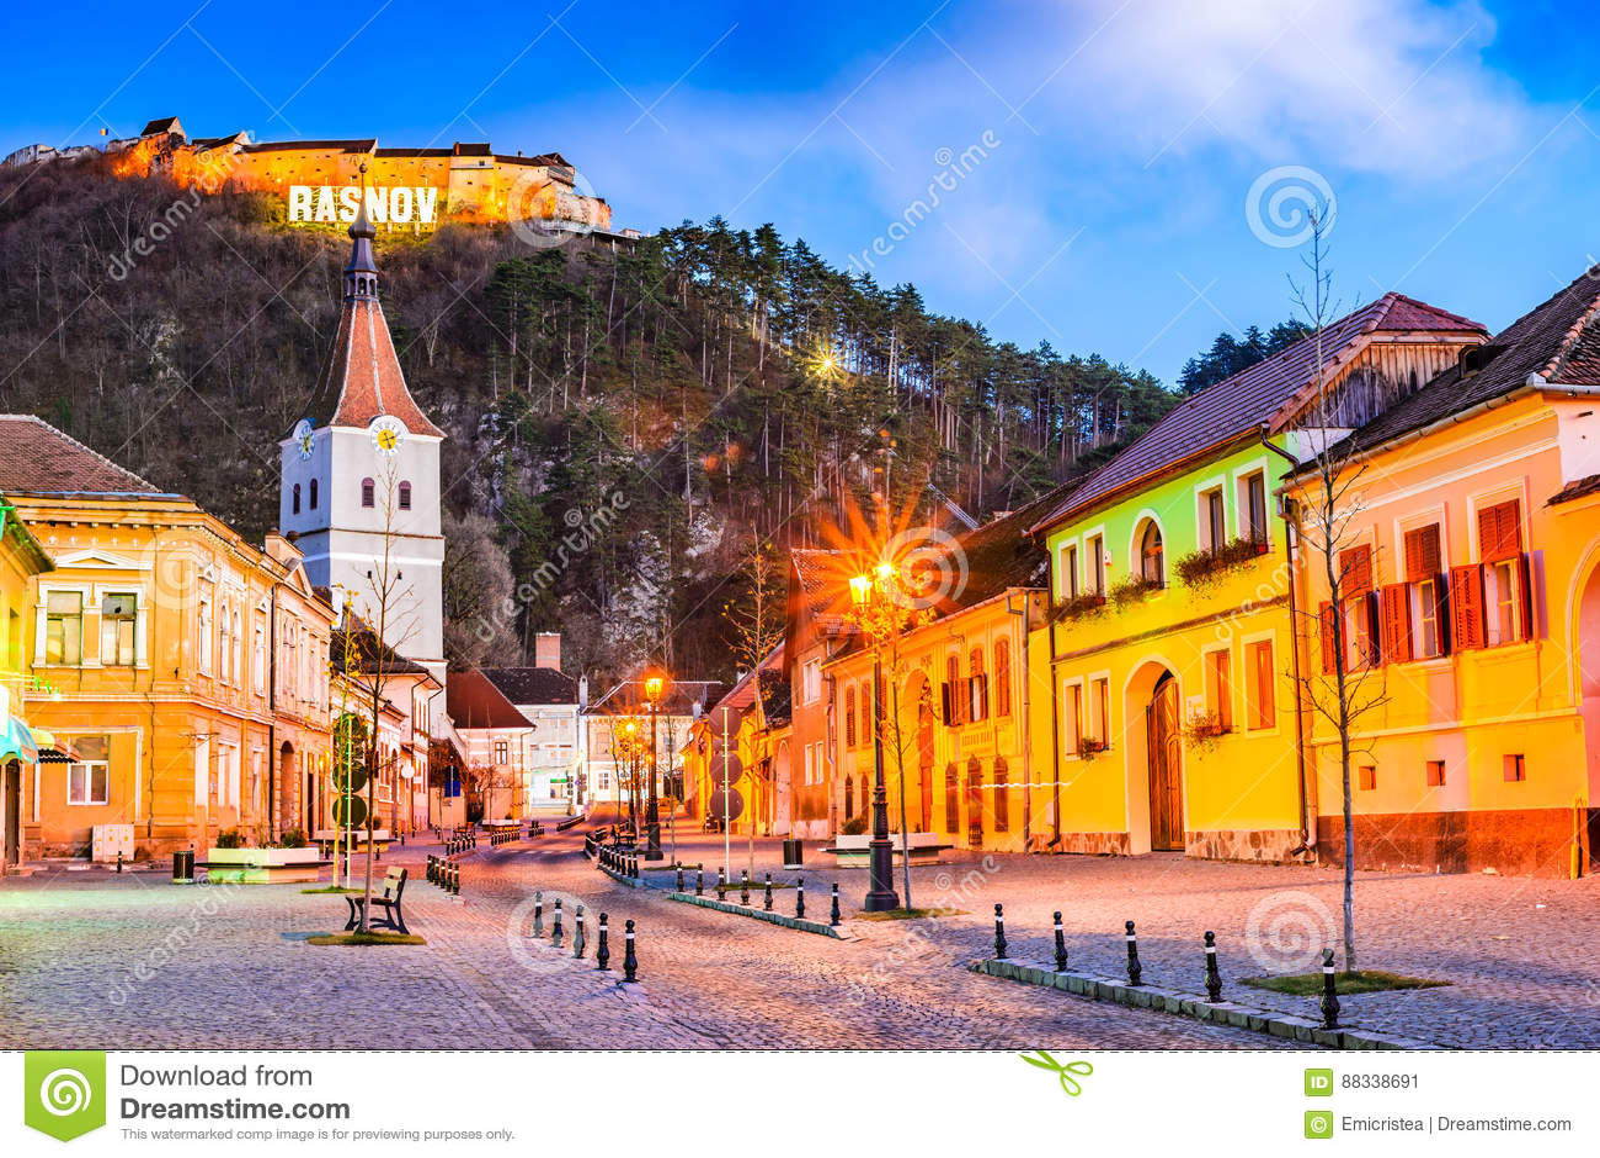 Rasnov, Rumänien